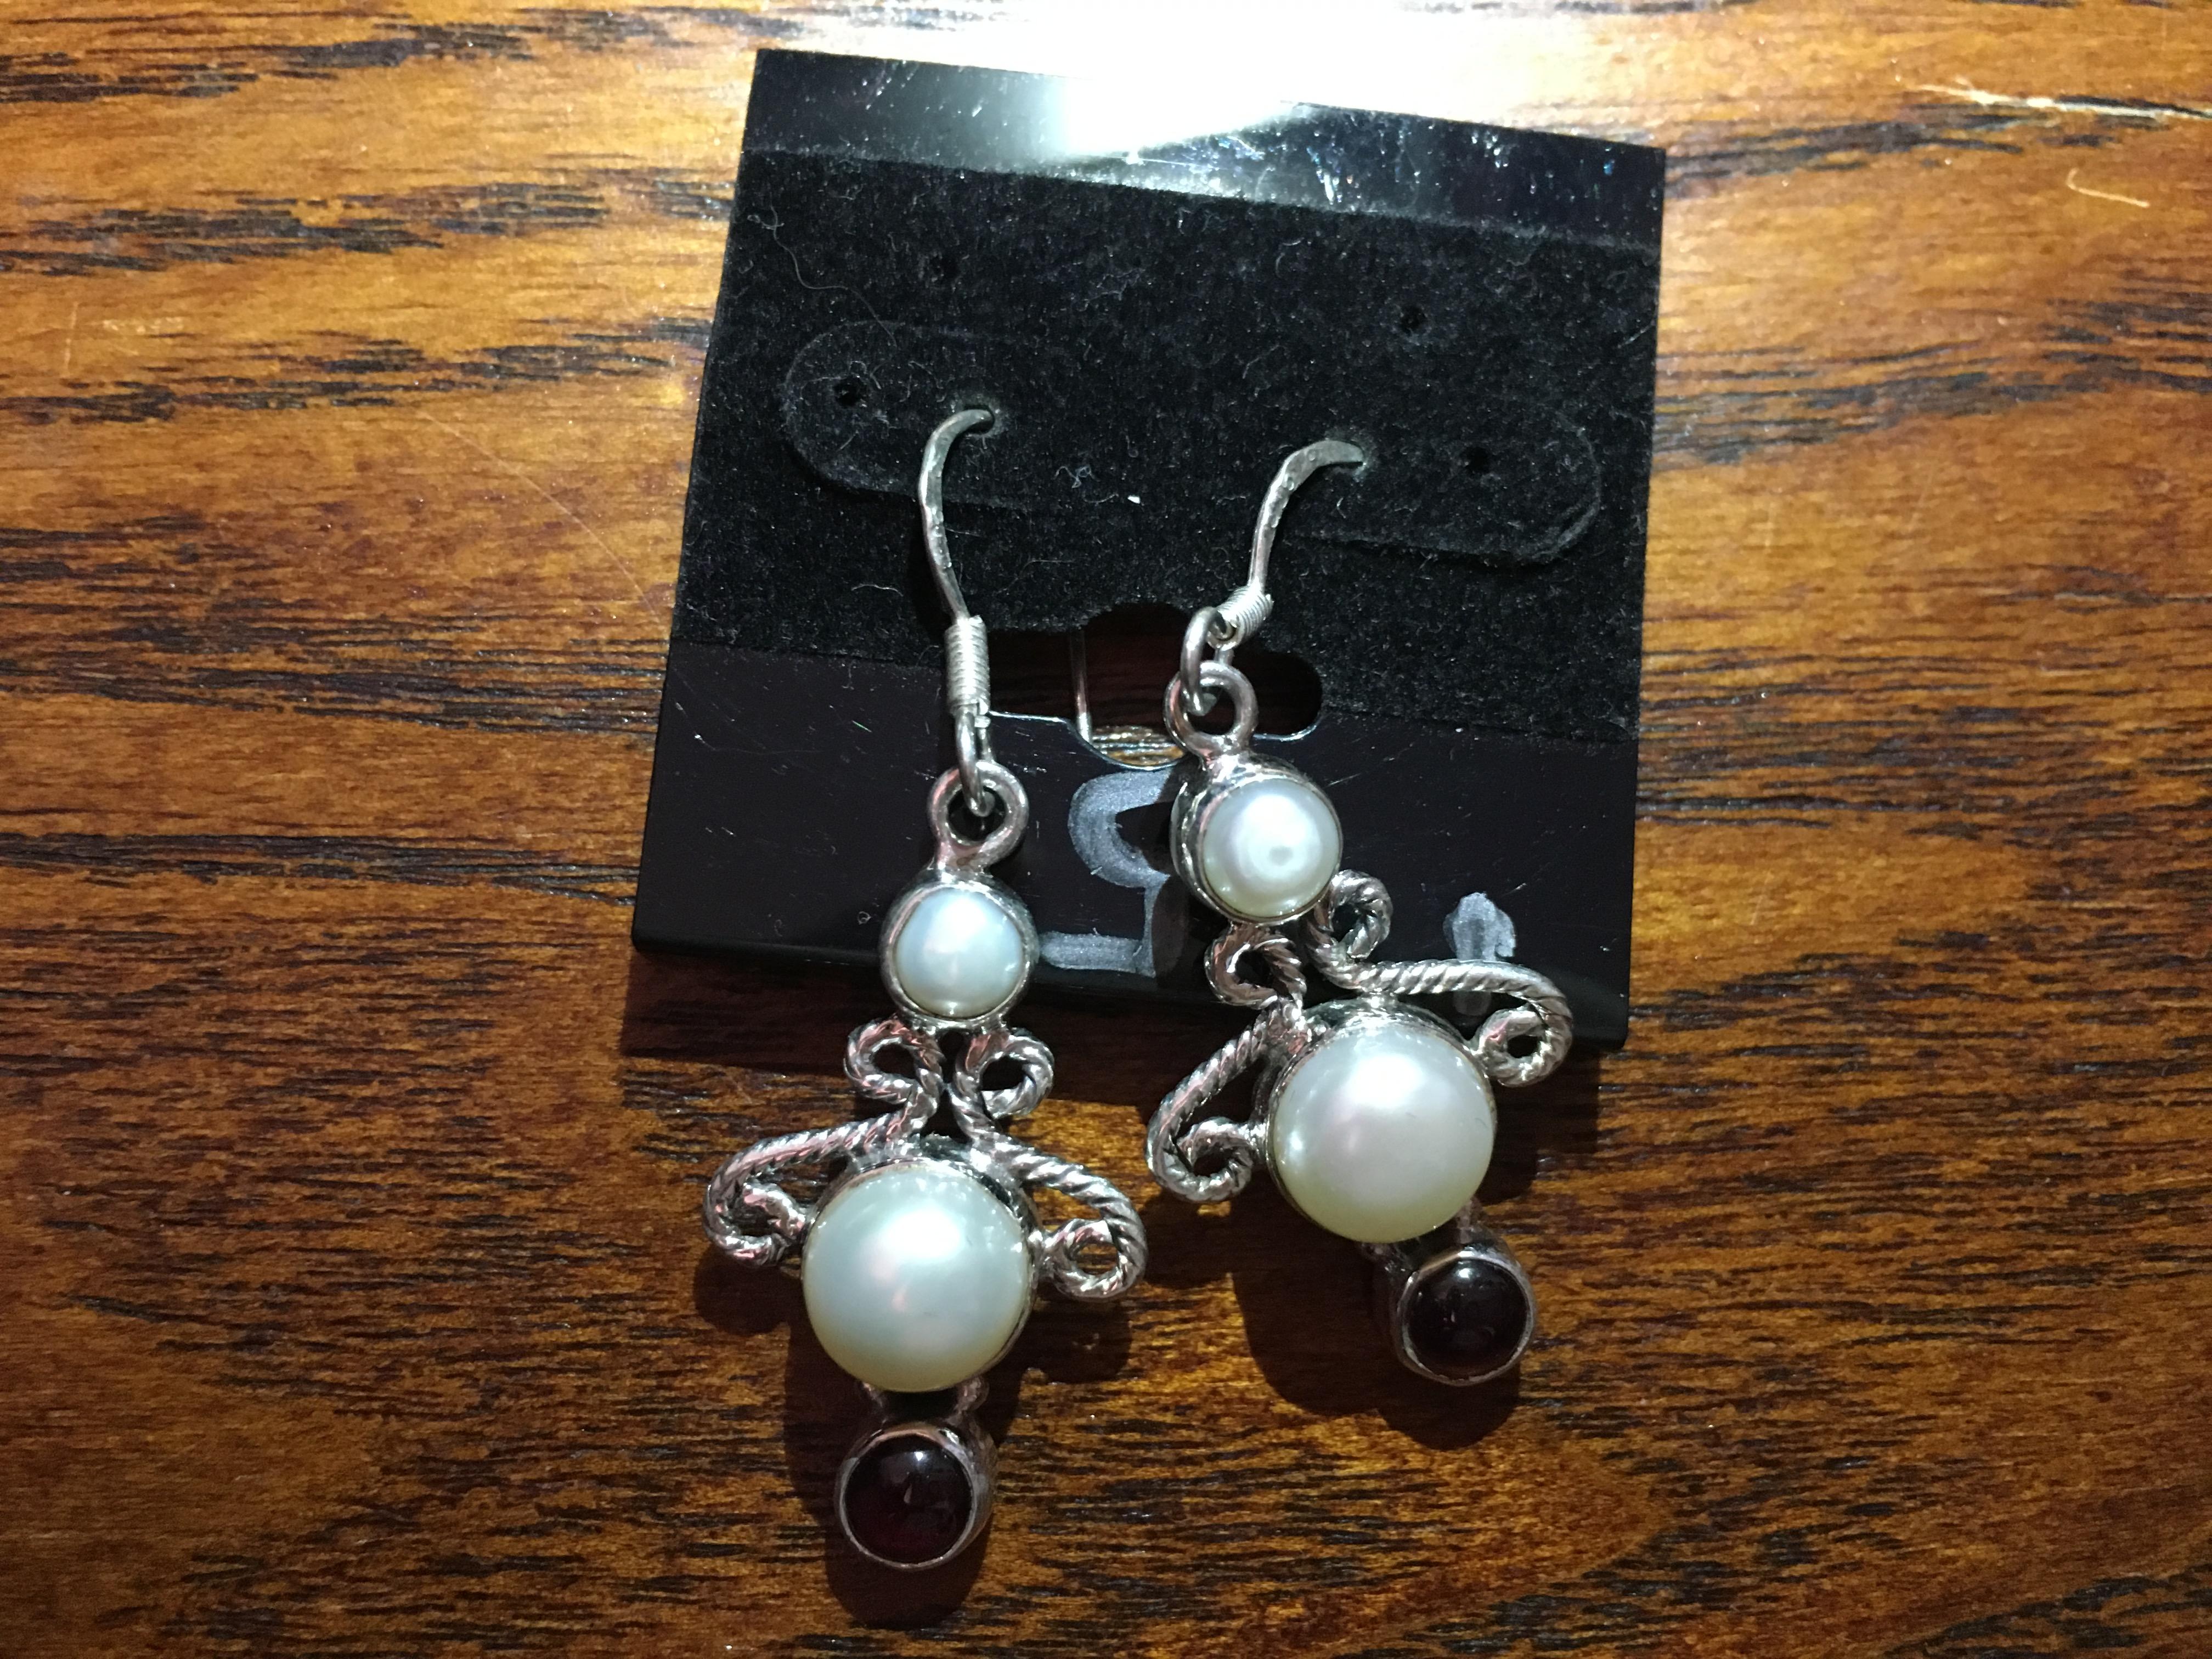 Garnet And Pearl Gemstone And .925 Sterling Silver Dangle Earrings